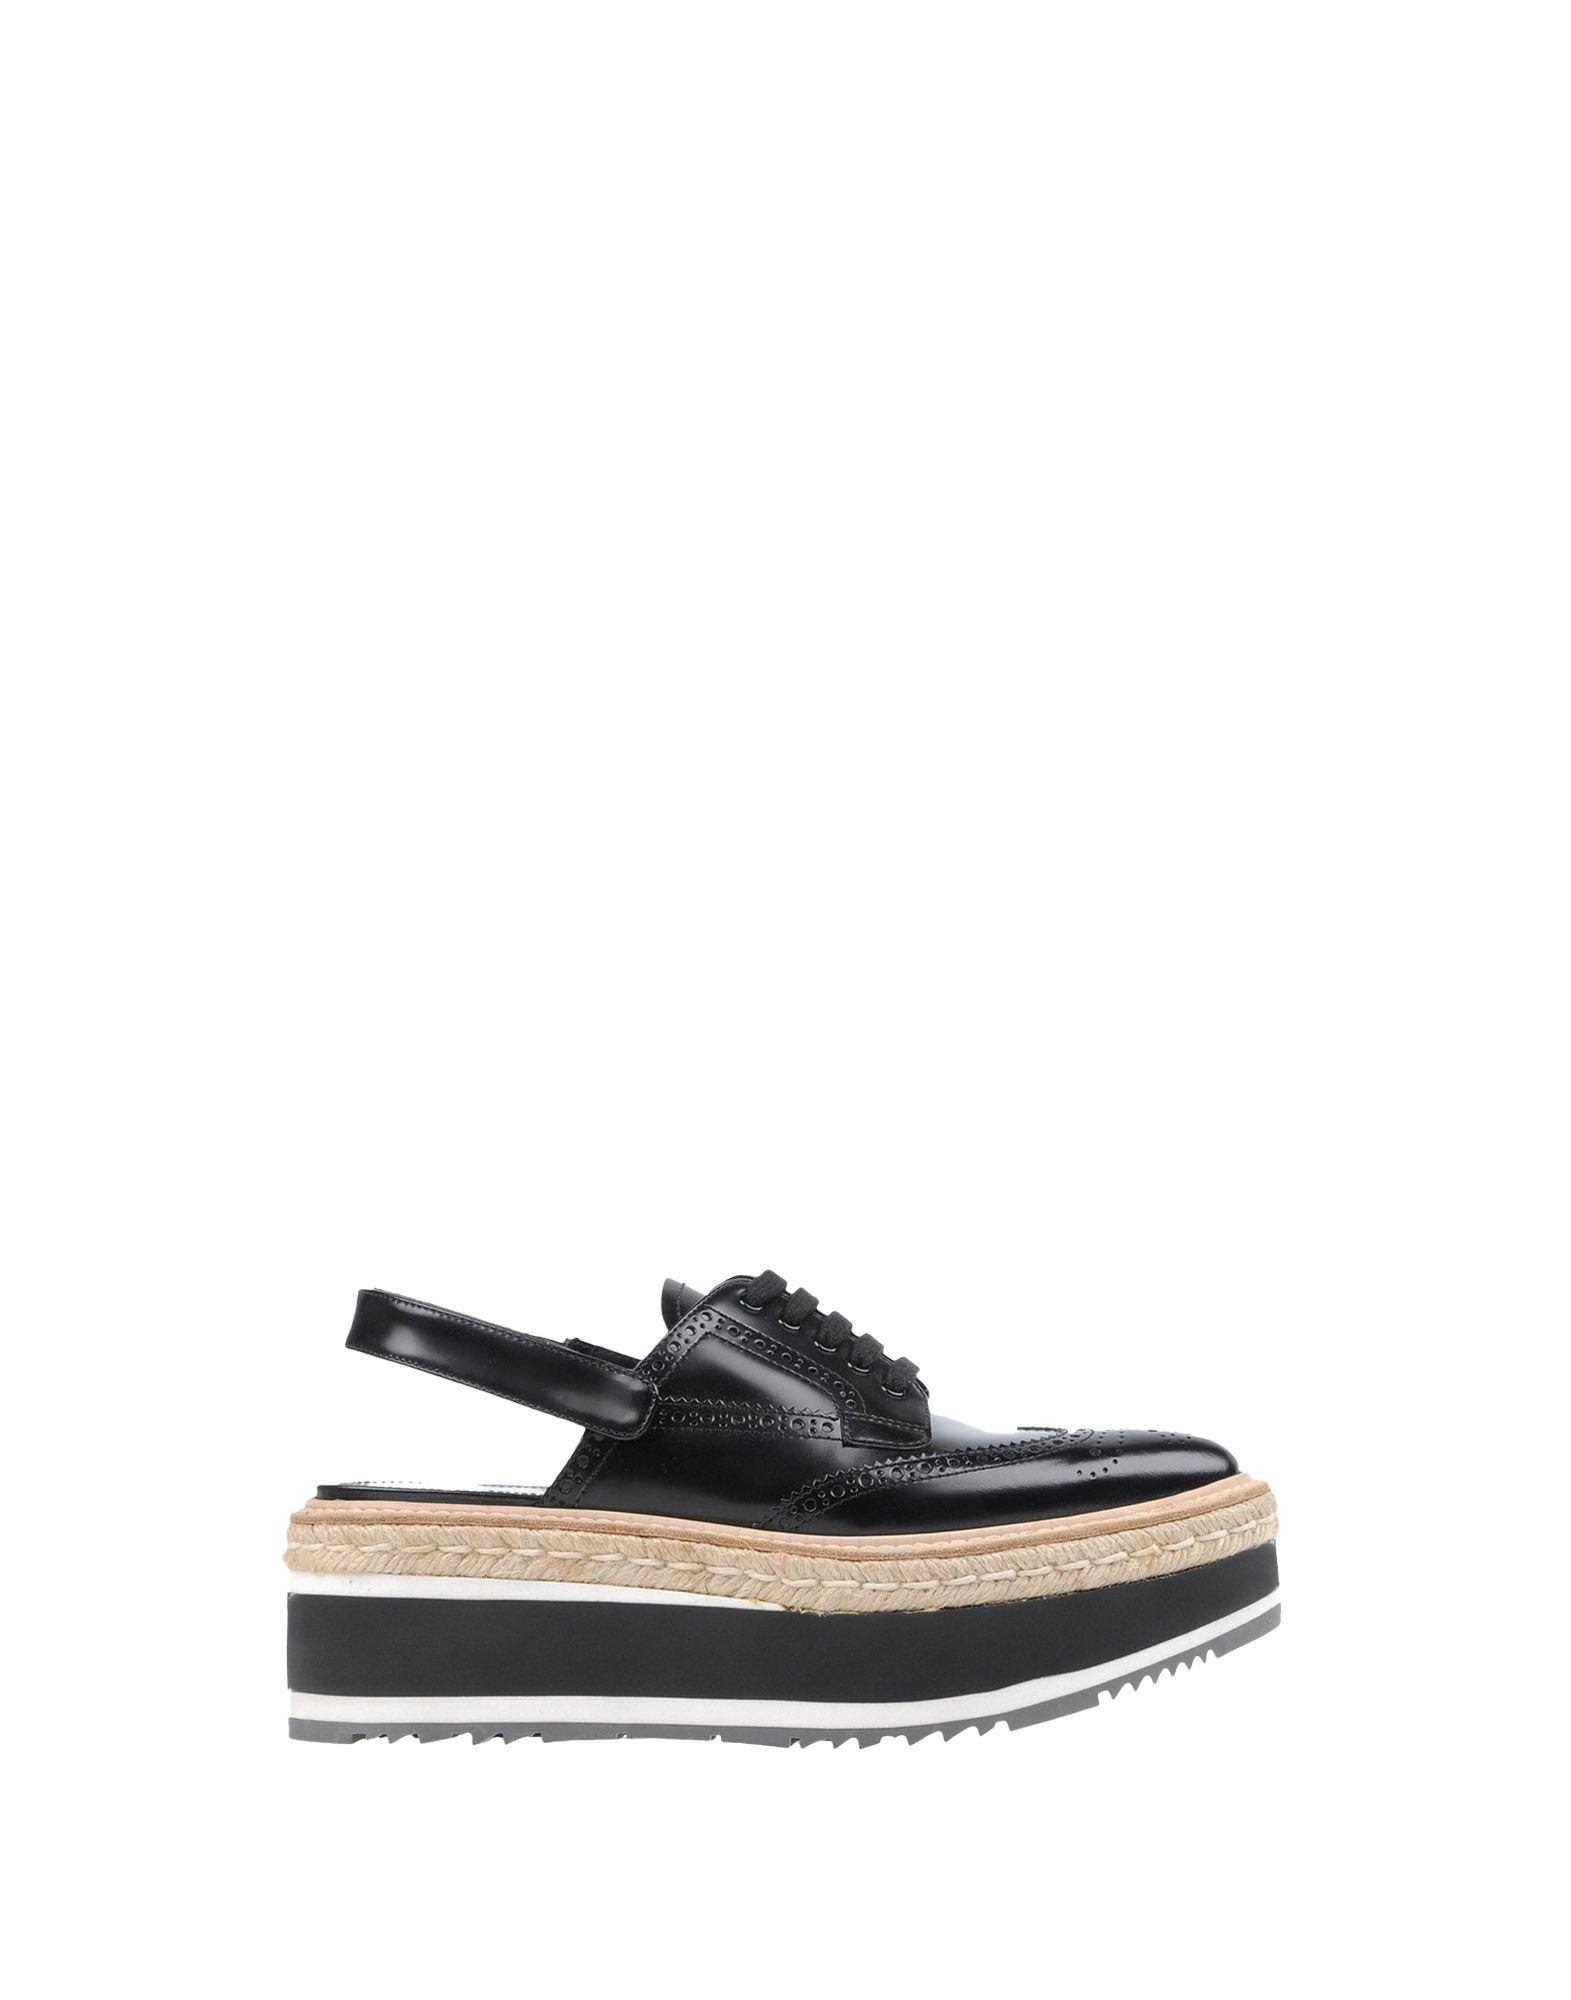 Chaussures - Tribunaux Tout Cavalli KnrEoD8Y1